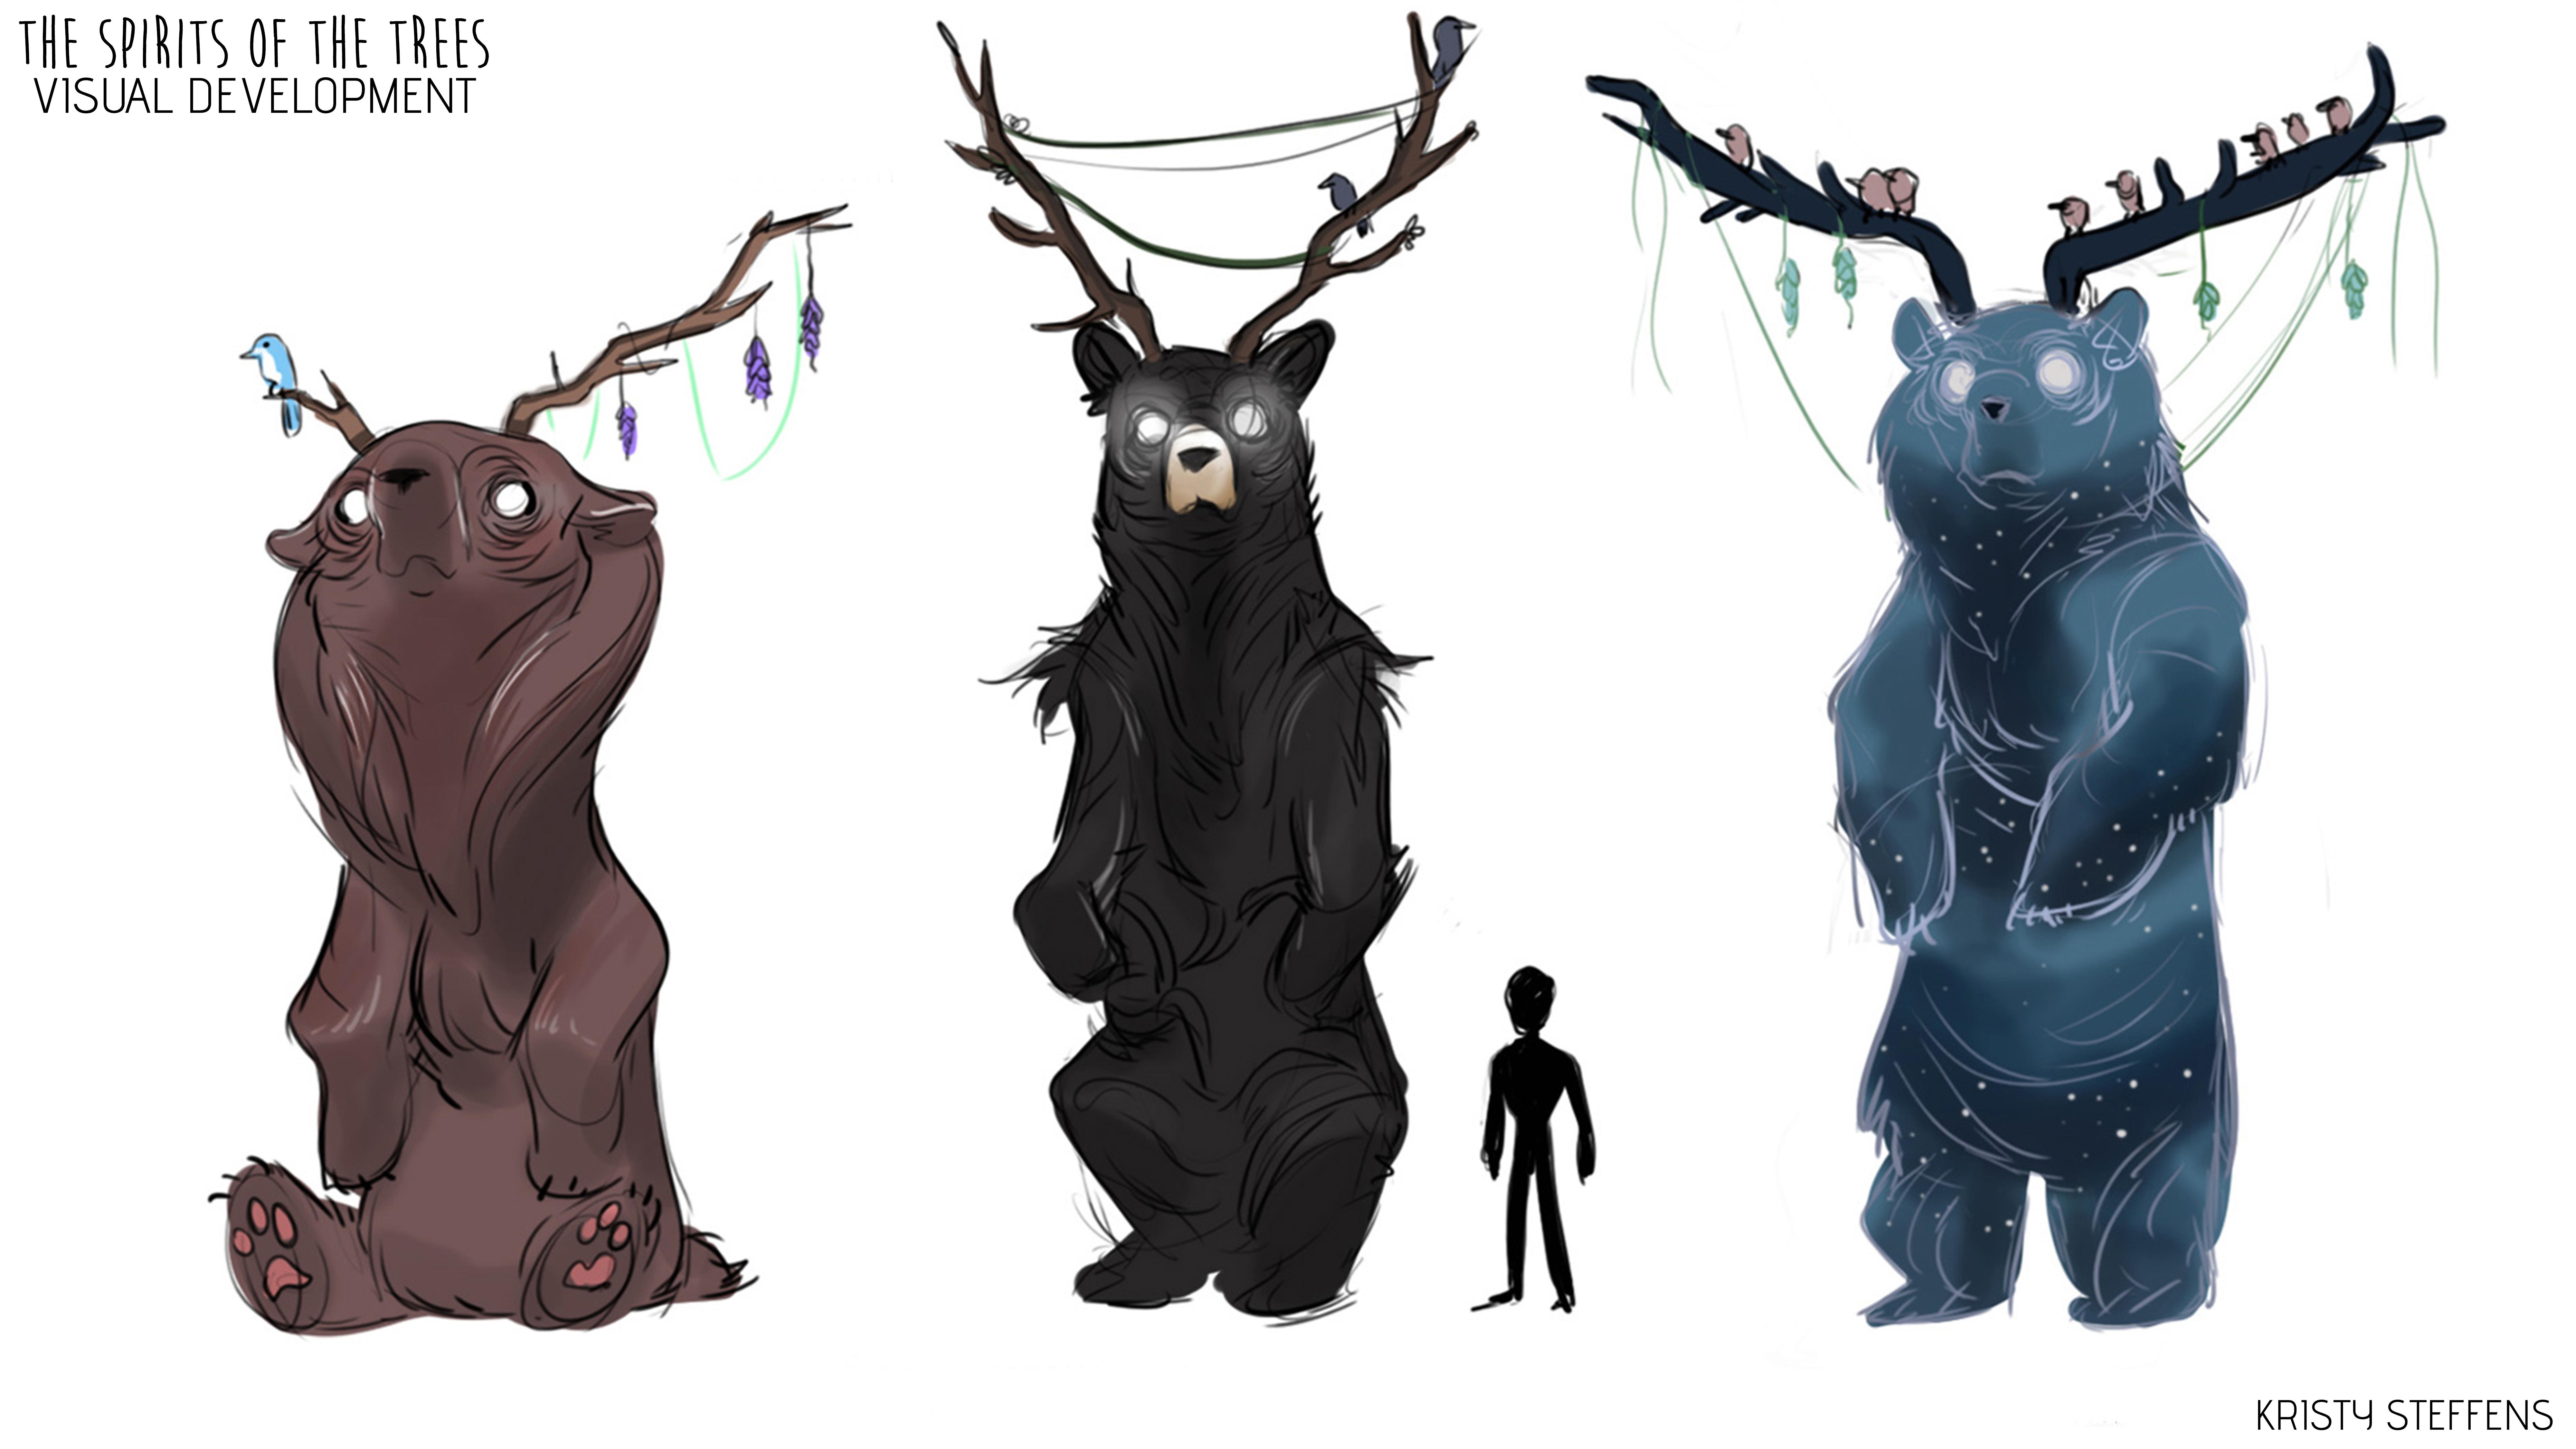 Spirits of the Trees - Development